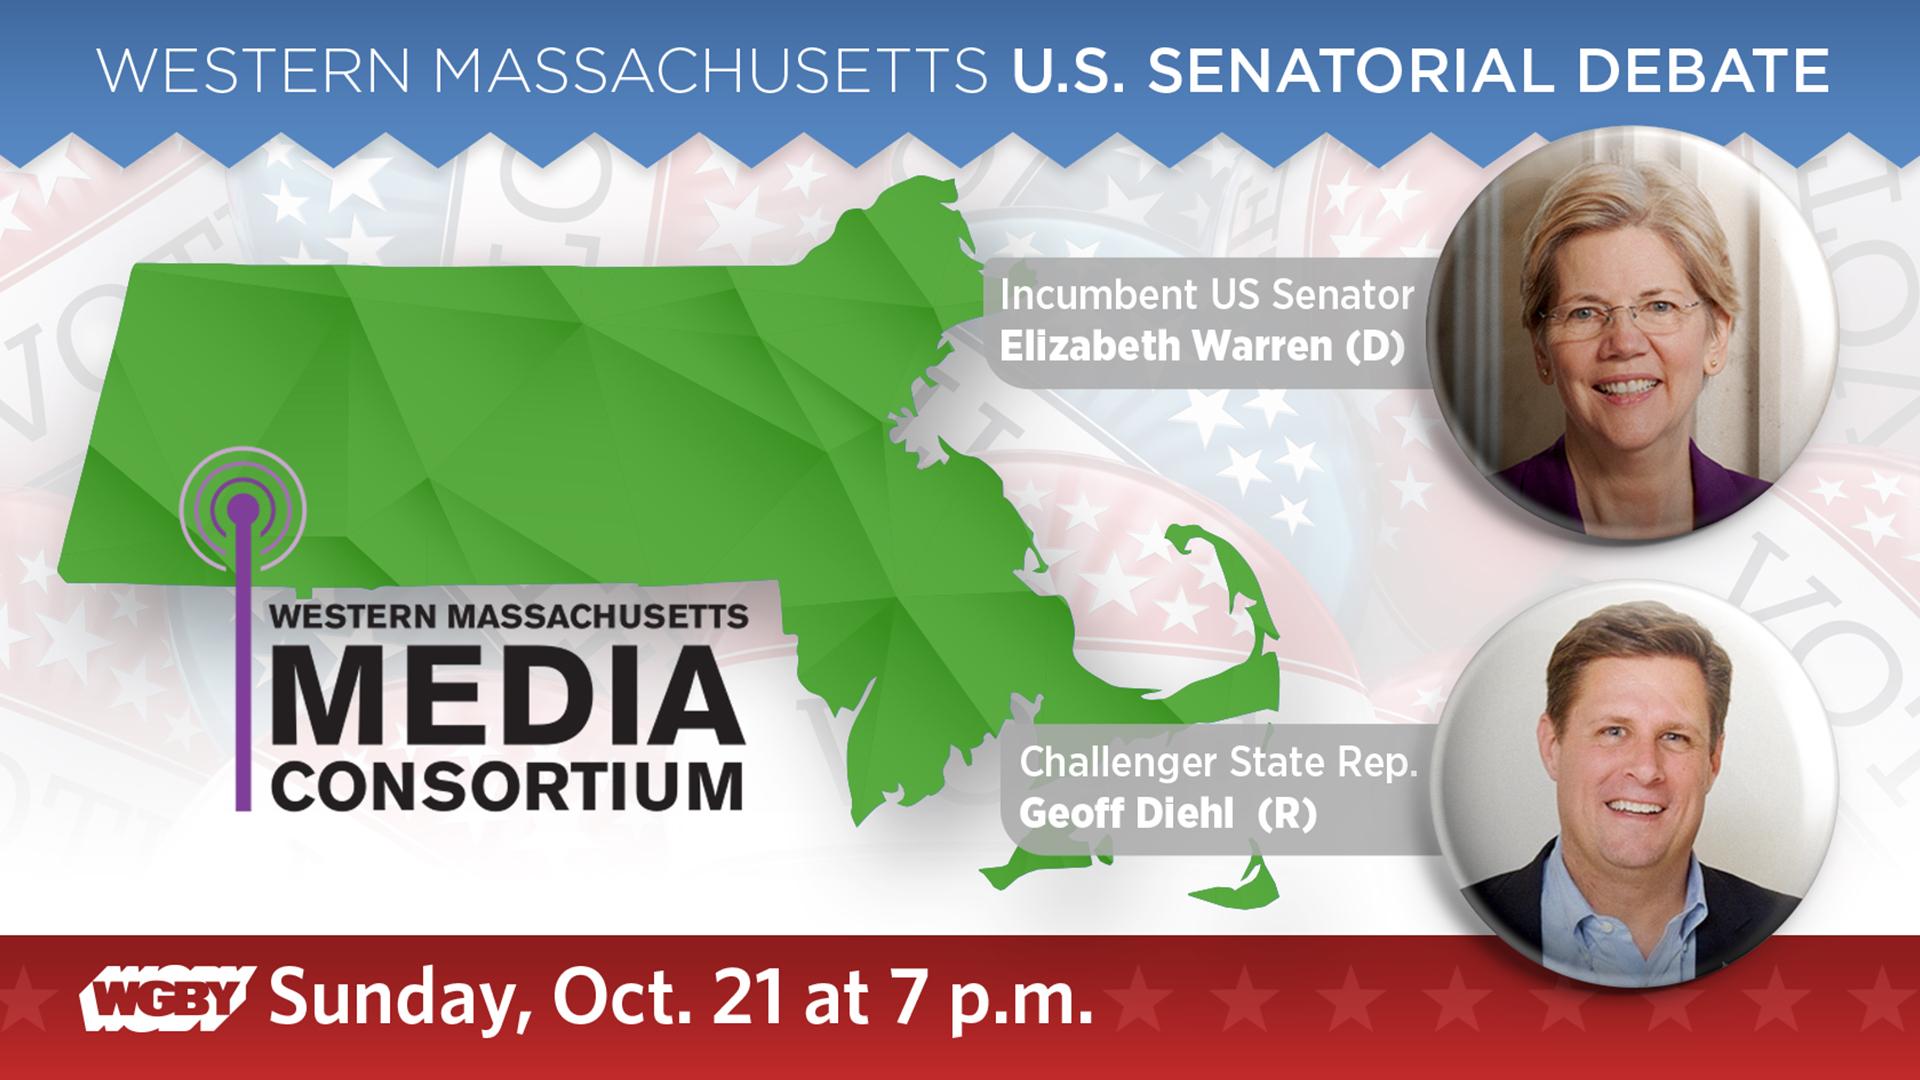 2018 Senatorial Debate with Elizabeth Warren and Geoff Diehl